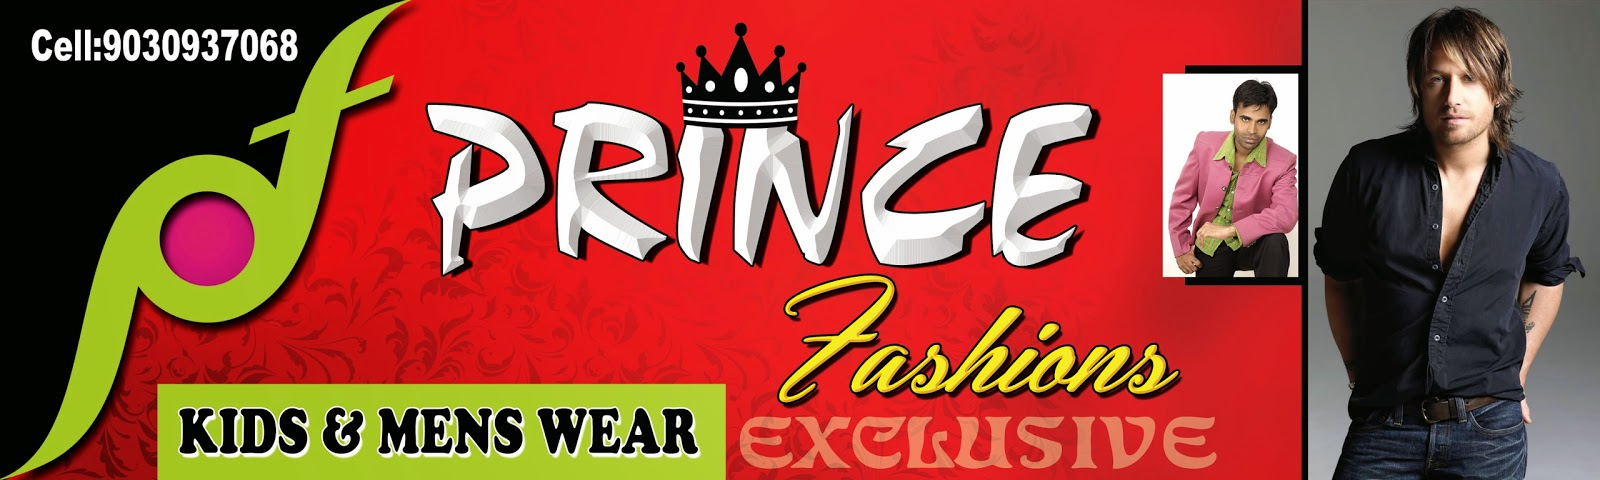 Prince Fashions Flex Banner Design Template Naveengfx